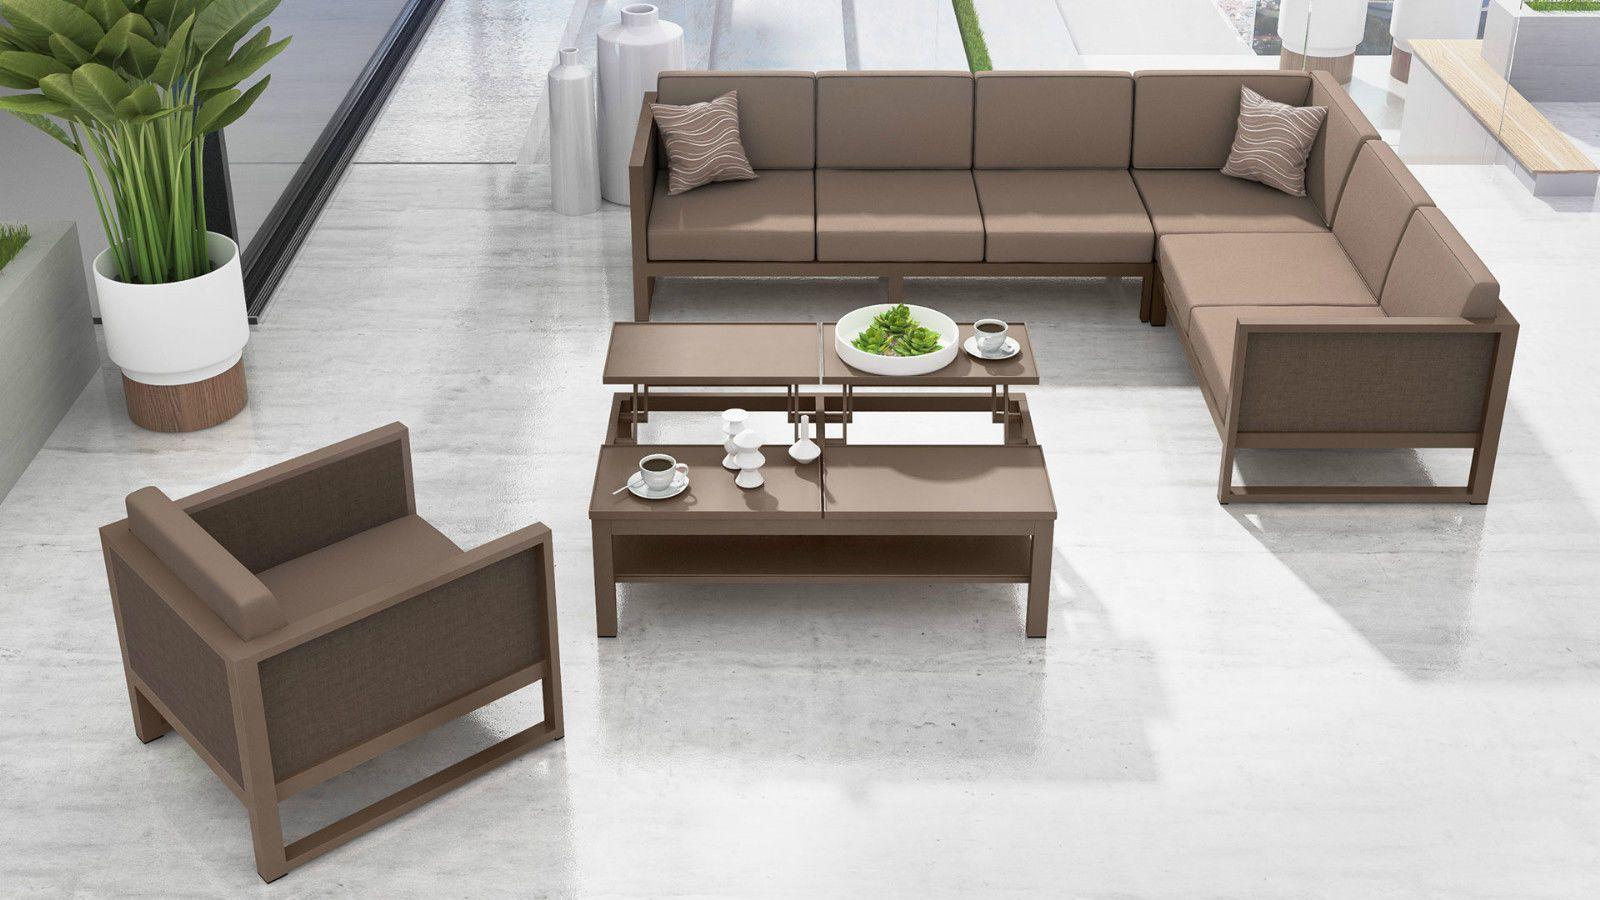 Gartenmobel Aluminium Sitzgruppe Lounge Murano 265x205 Cm Taupe